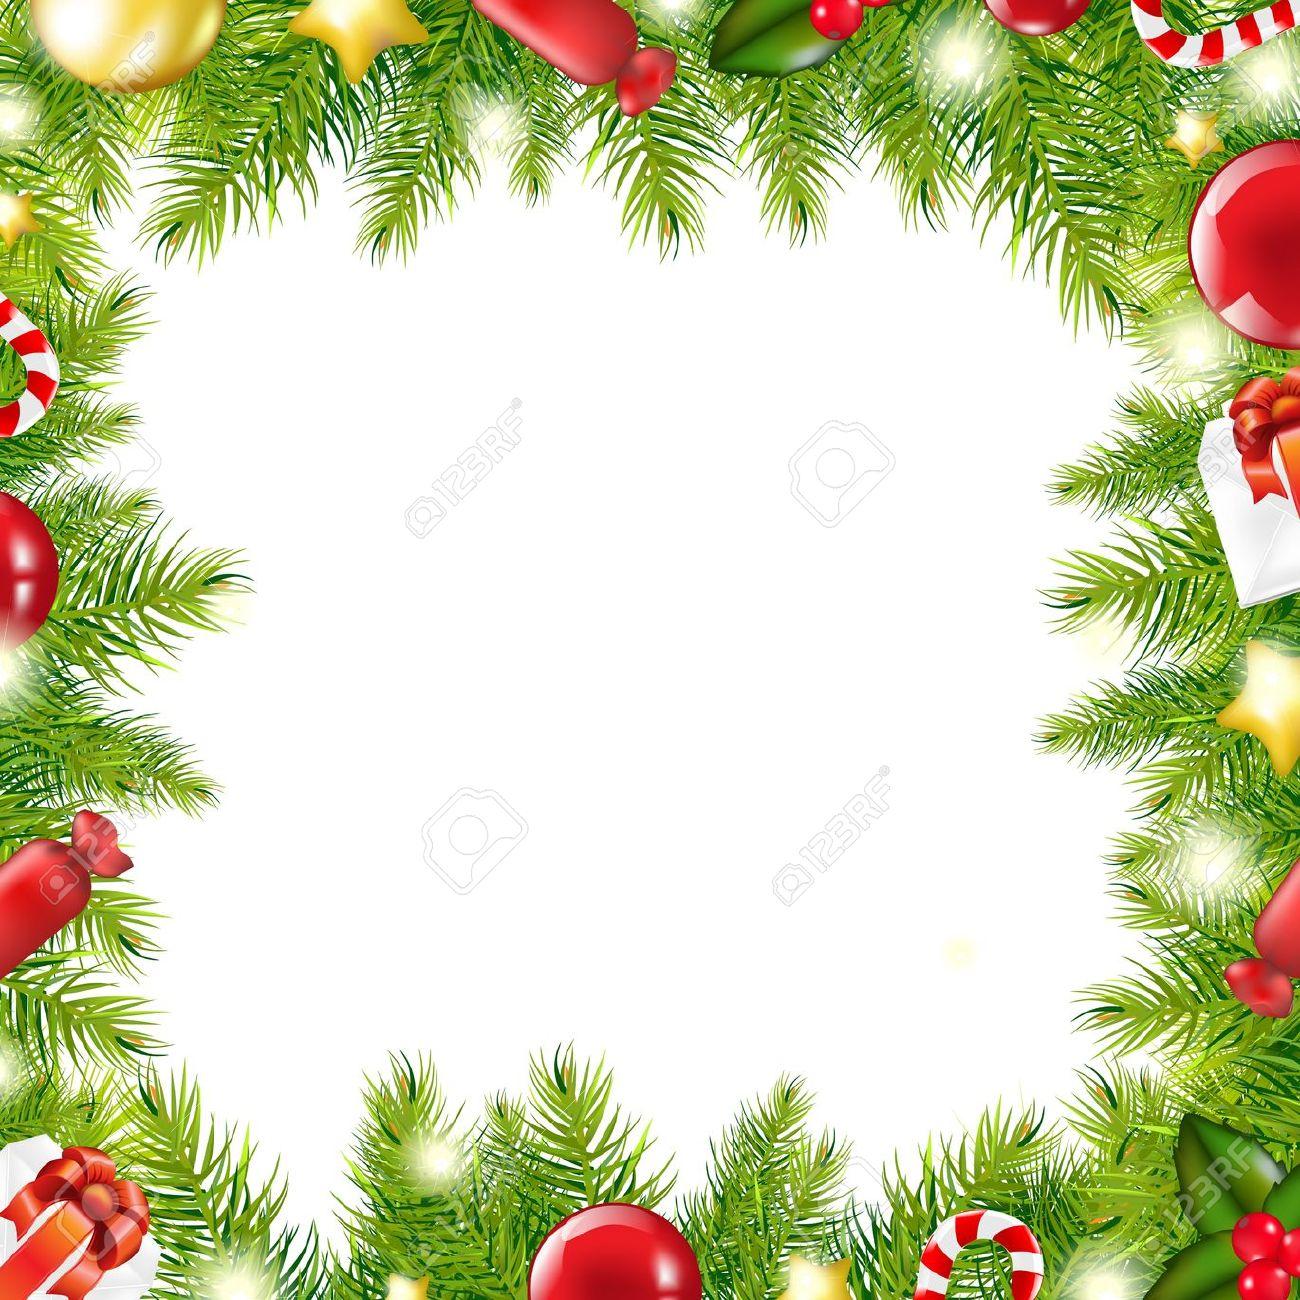 Christmas Border Clipart Horizontal.